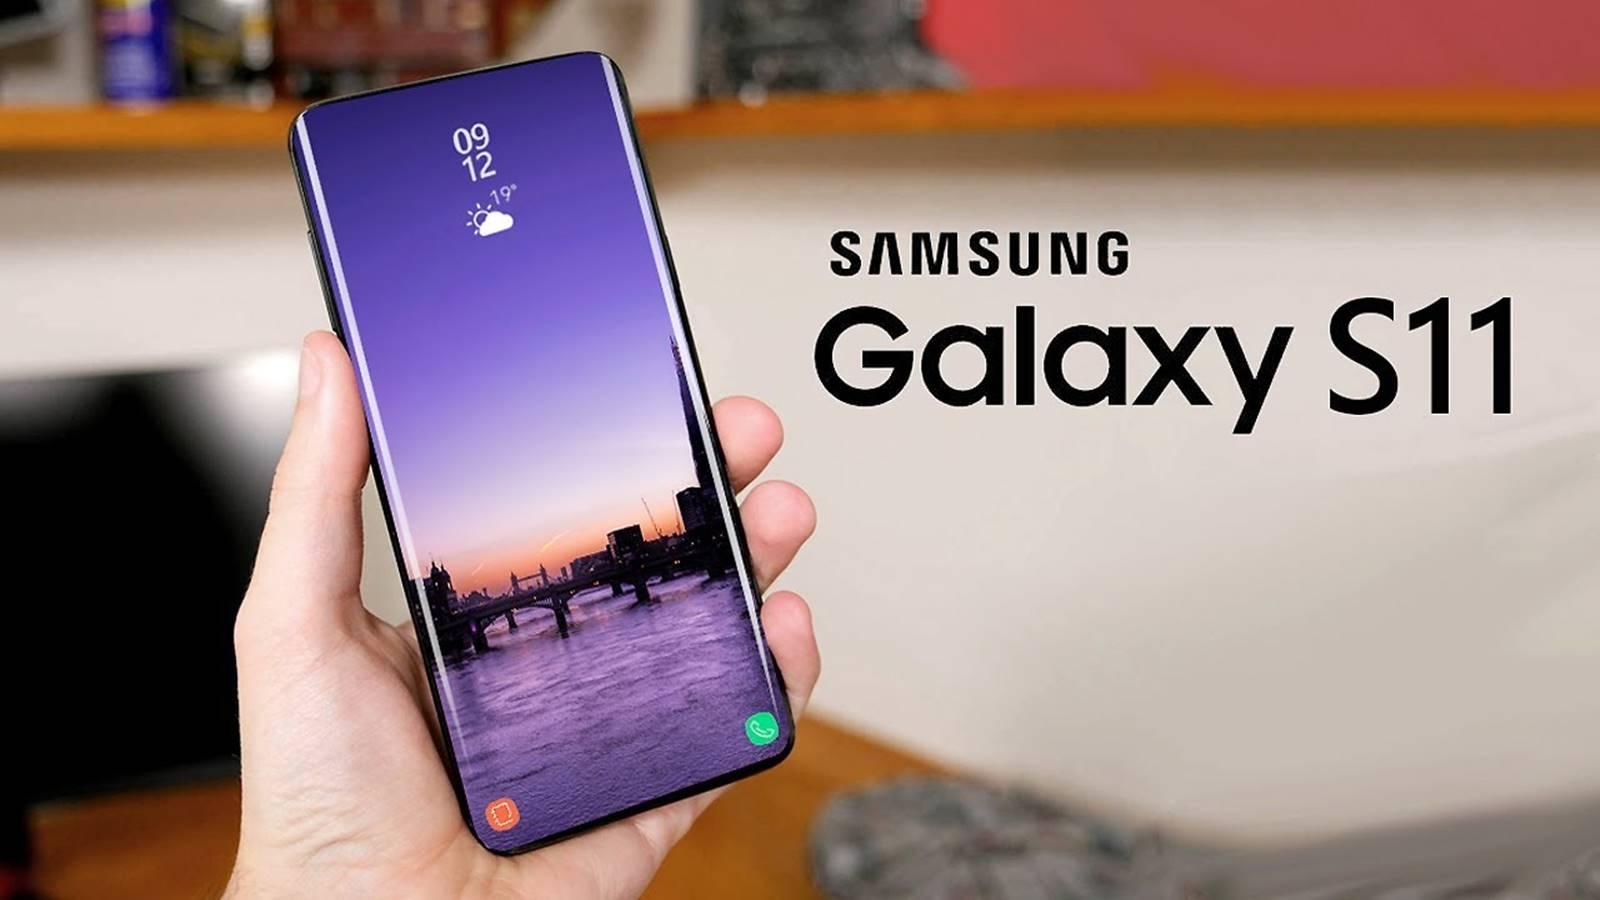 Samsung GALAXY S11 picasso